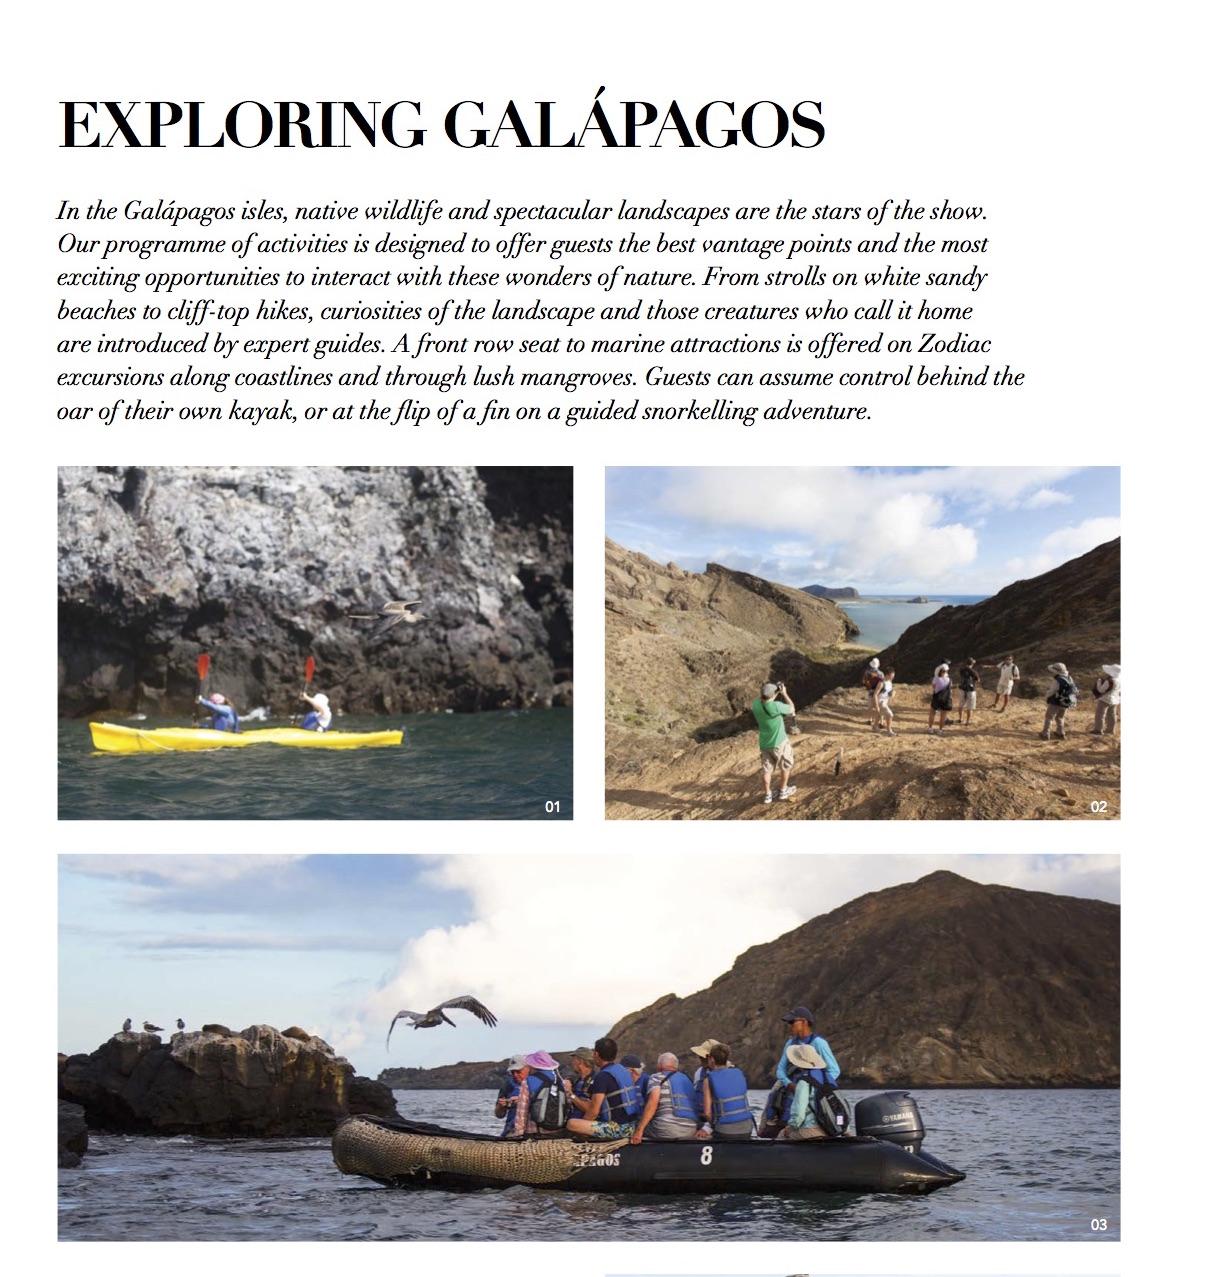 DIRECT MAIL Galapagos Page 5.jpg